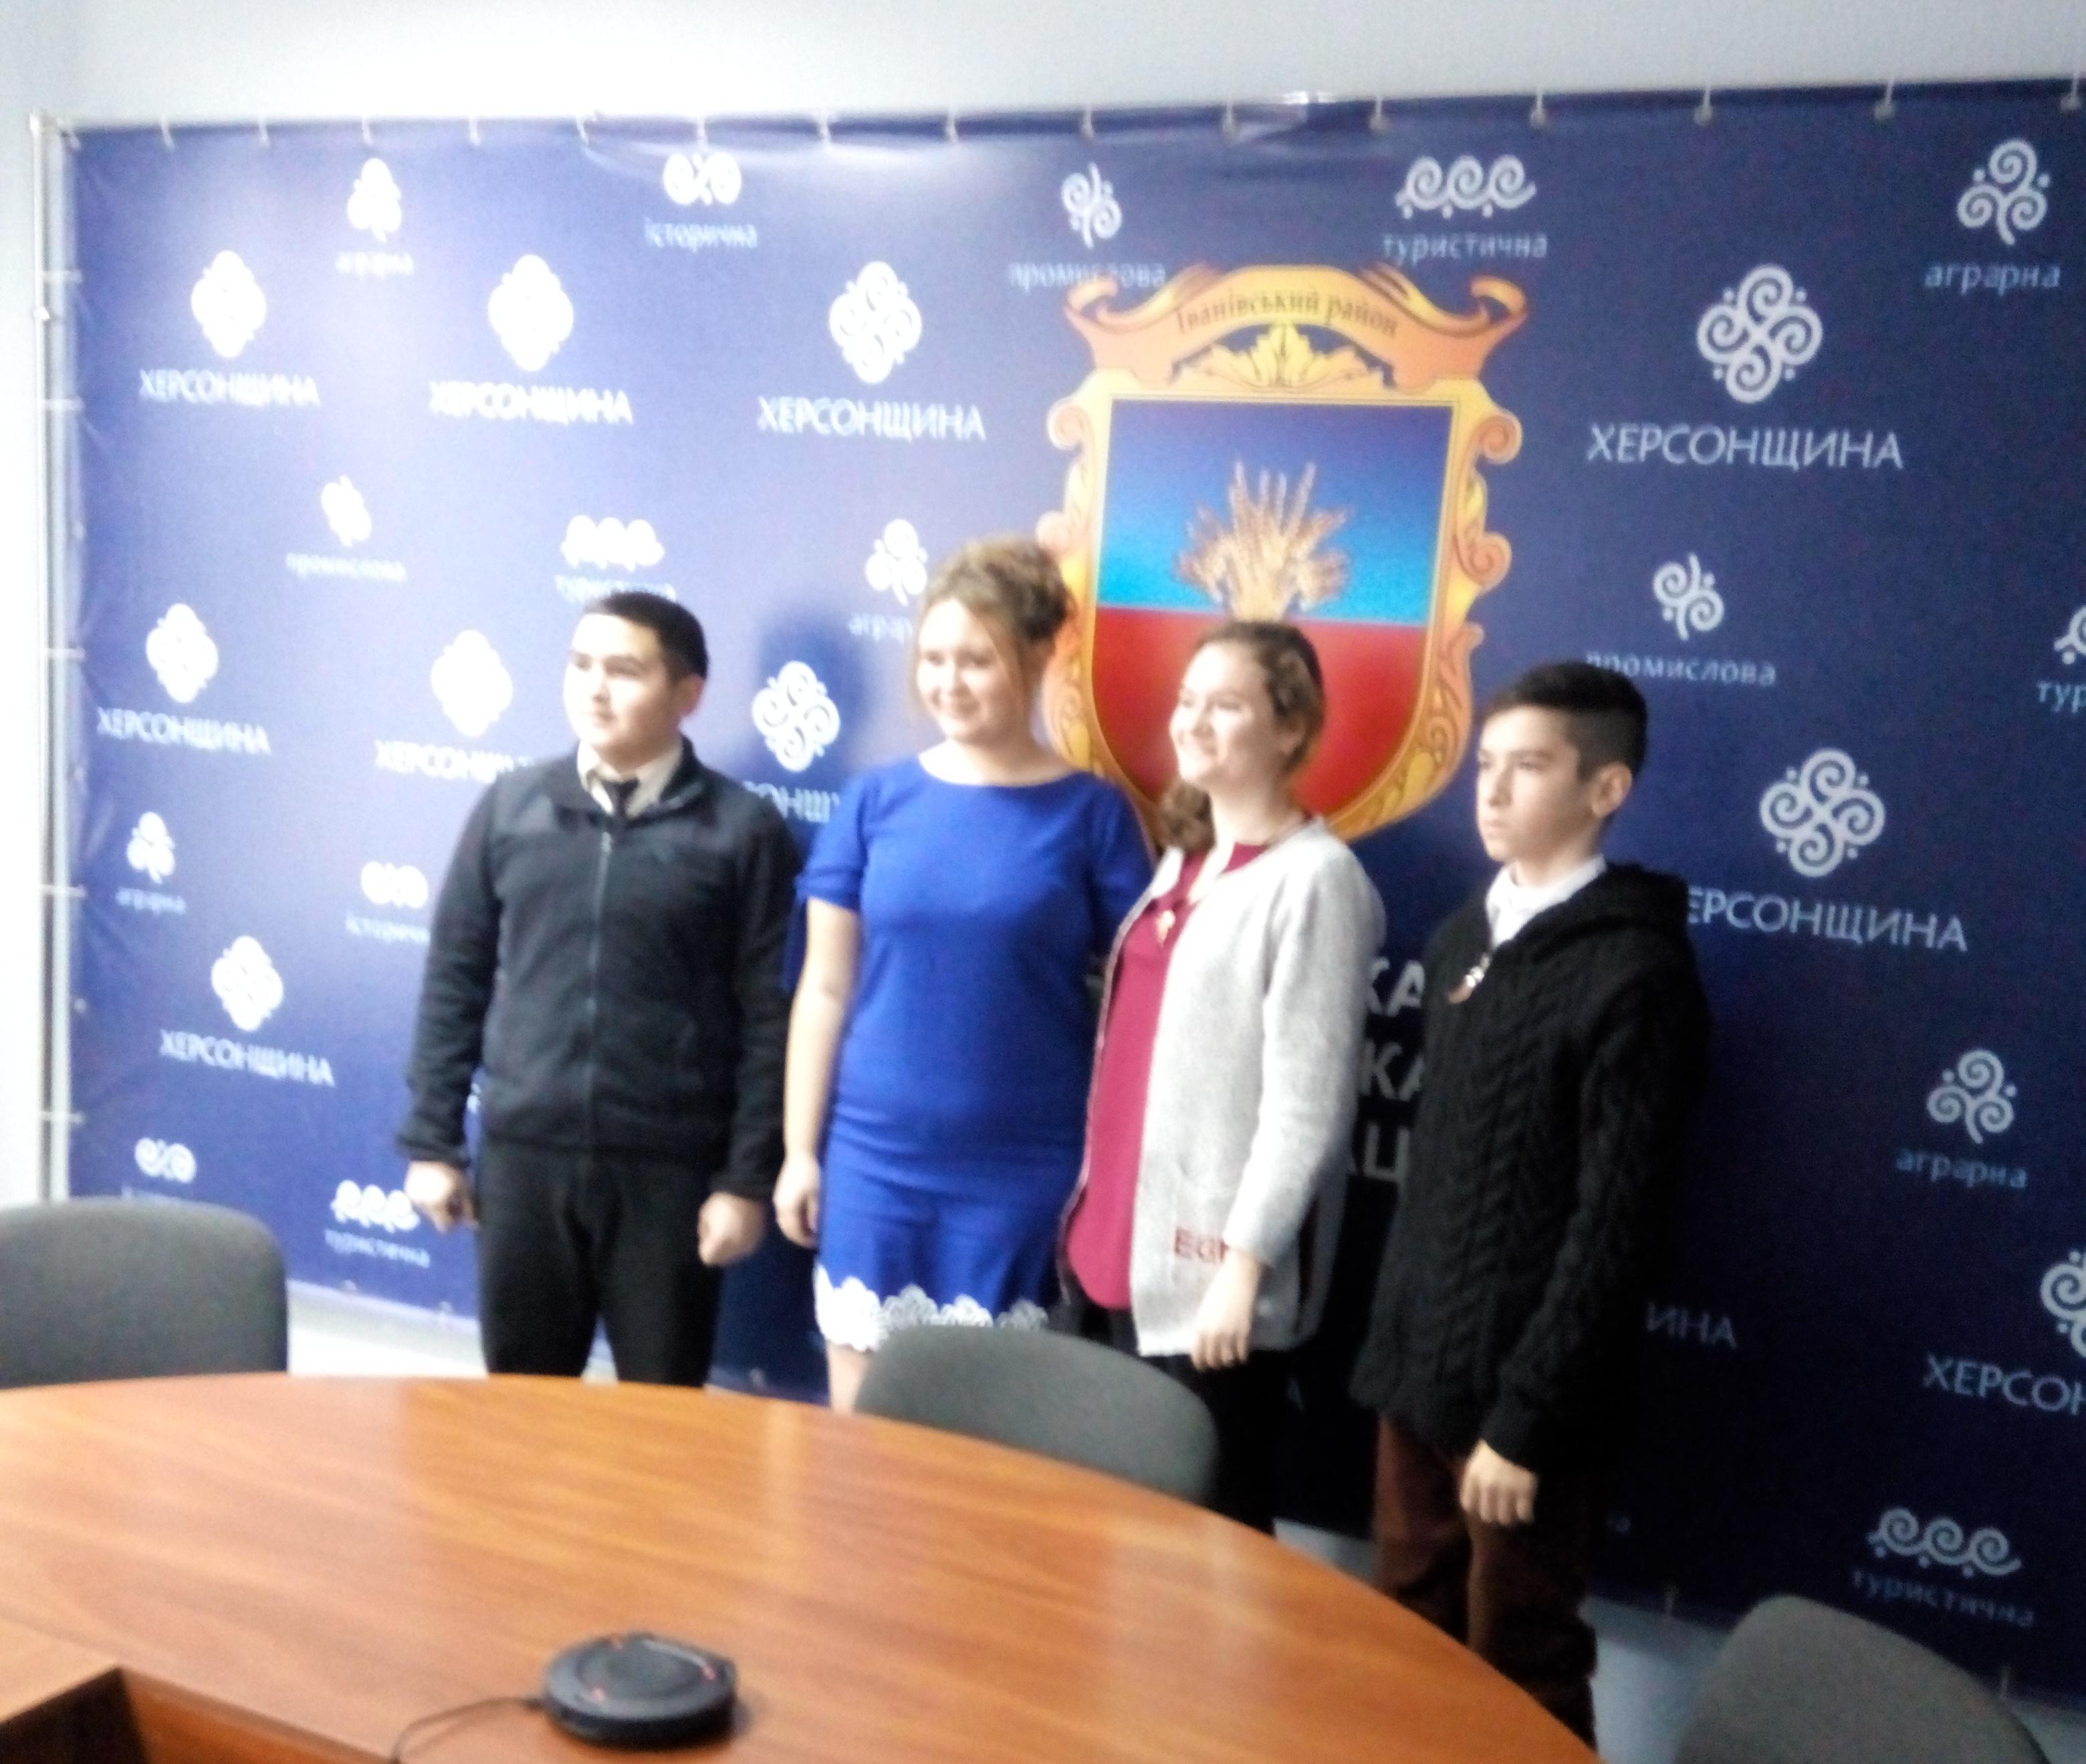 http://ivanivka-osvita.ucoz.ru/3/19/IMG_20181221_100842.jpg